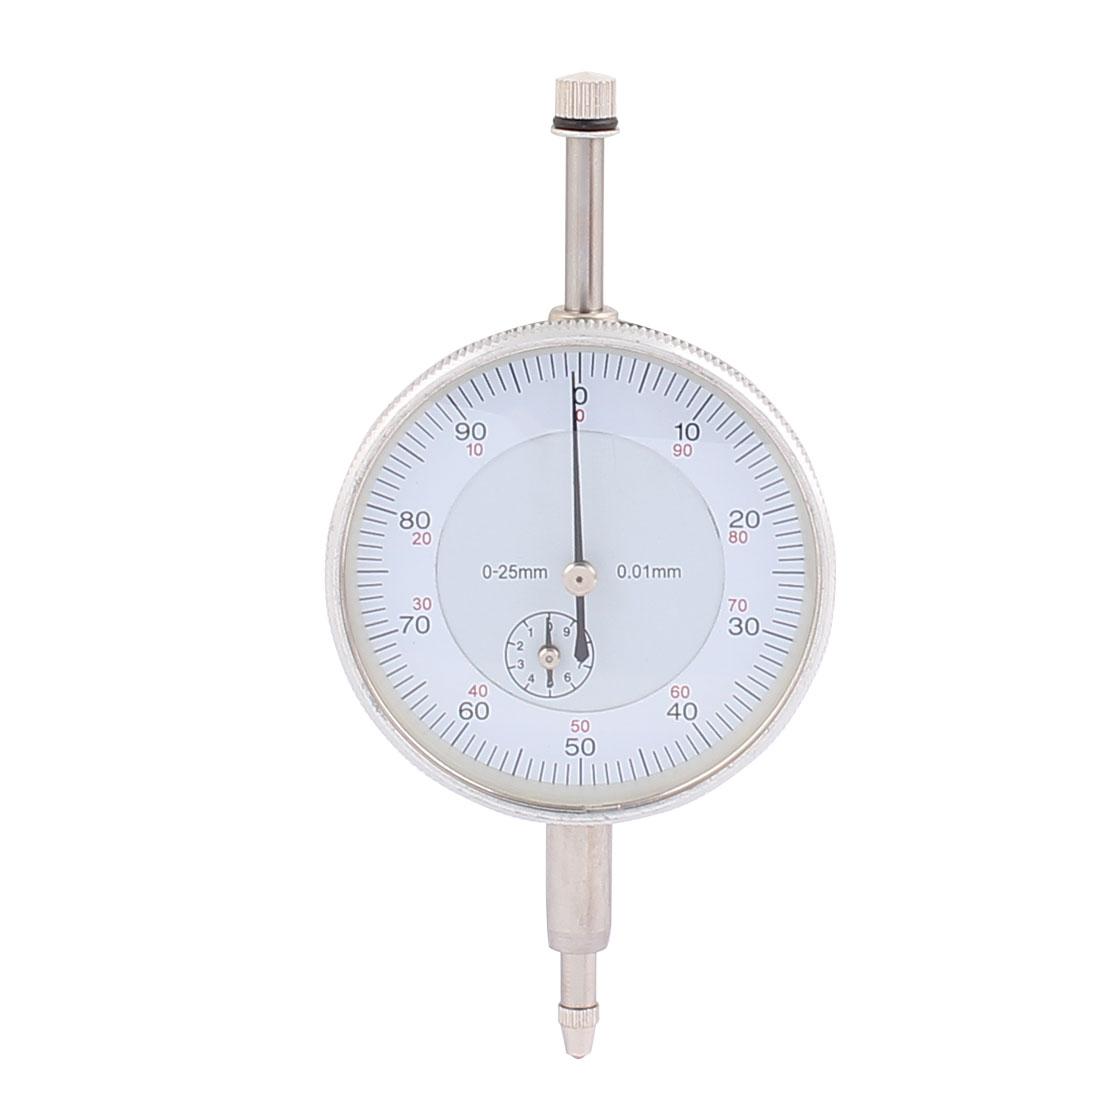 0.025mm Accuracy Measurement Instrument Dial Indicator Gauge Precision Tool